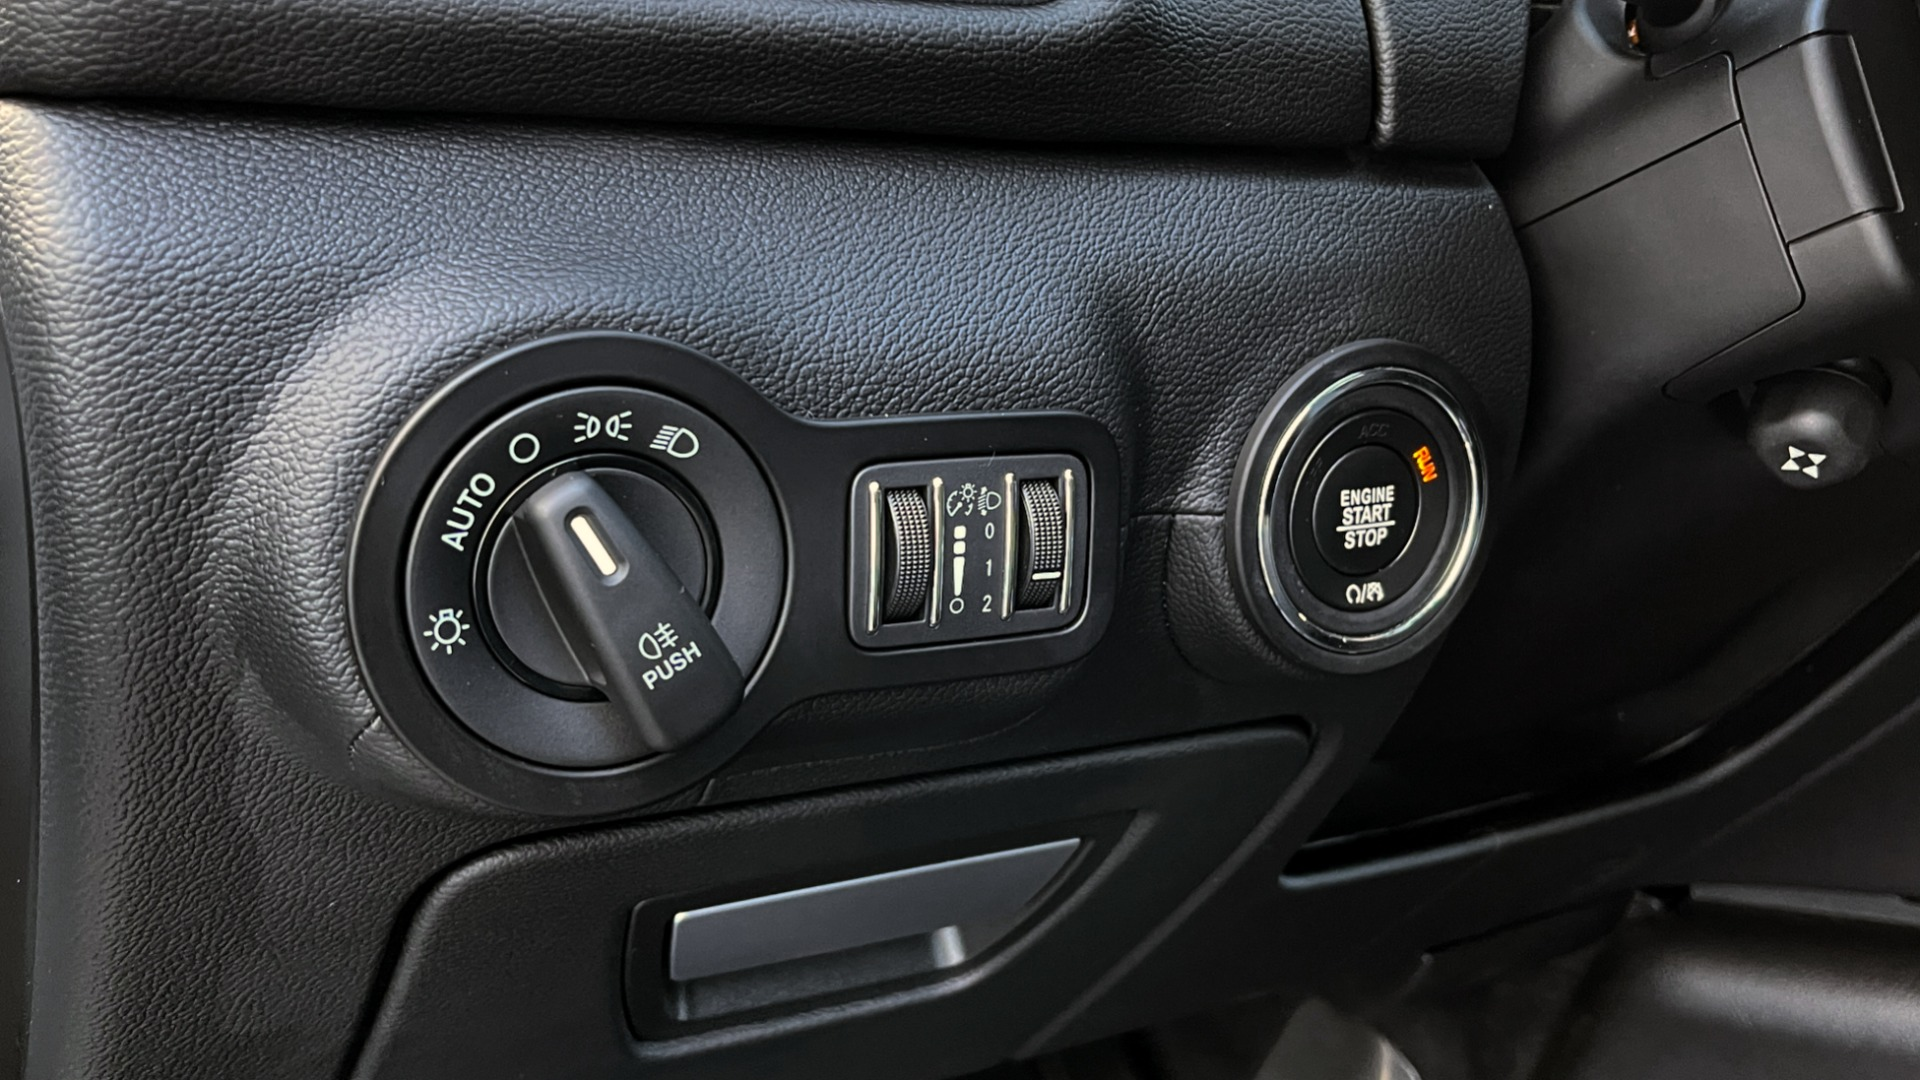 Used 2018 Maserati GHIBLI SEDAN / RWD / 3.0L V6 / SUNROOF / NAV / REARVIEW for sale $42,995 at Formula Imports in Charlotte NC 28227 31